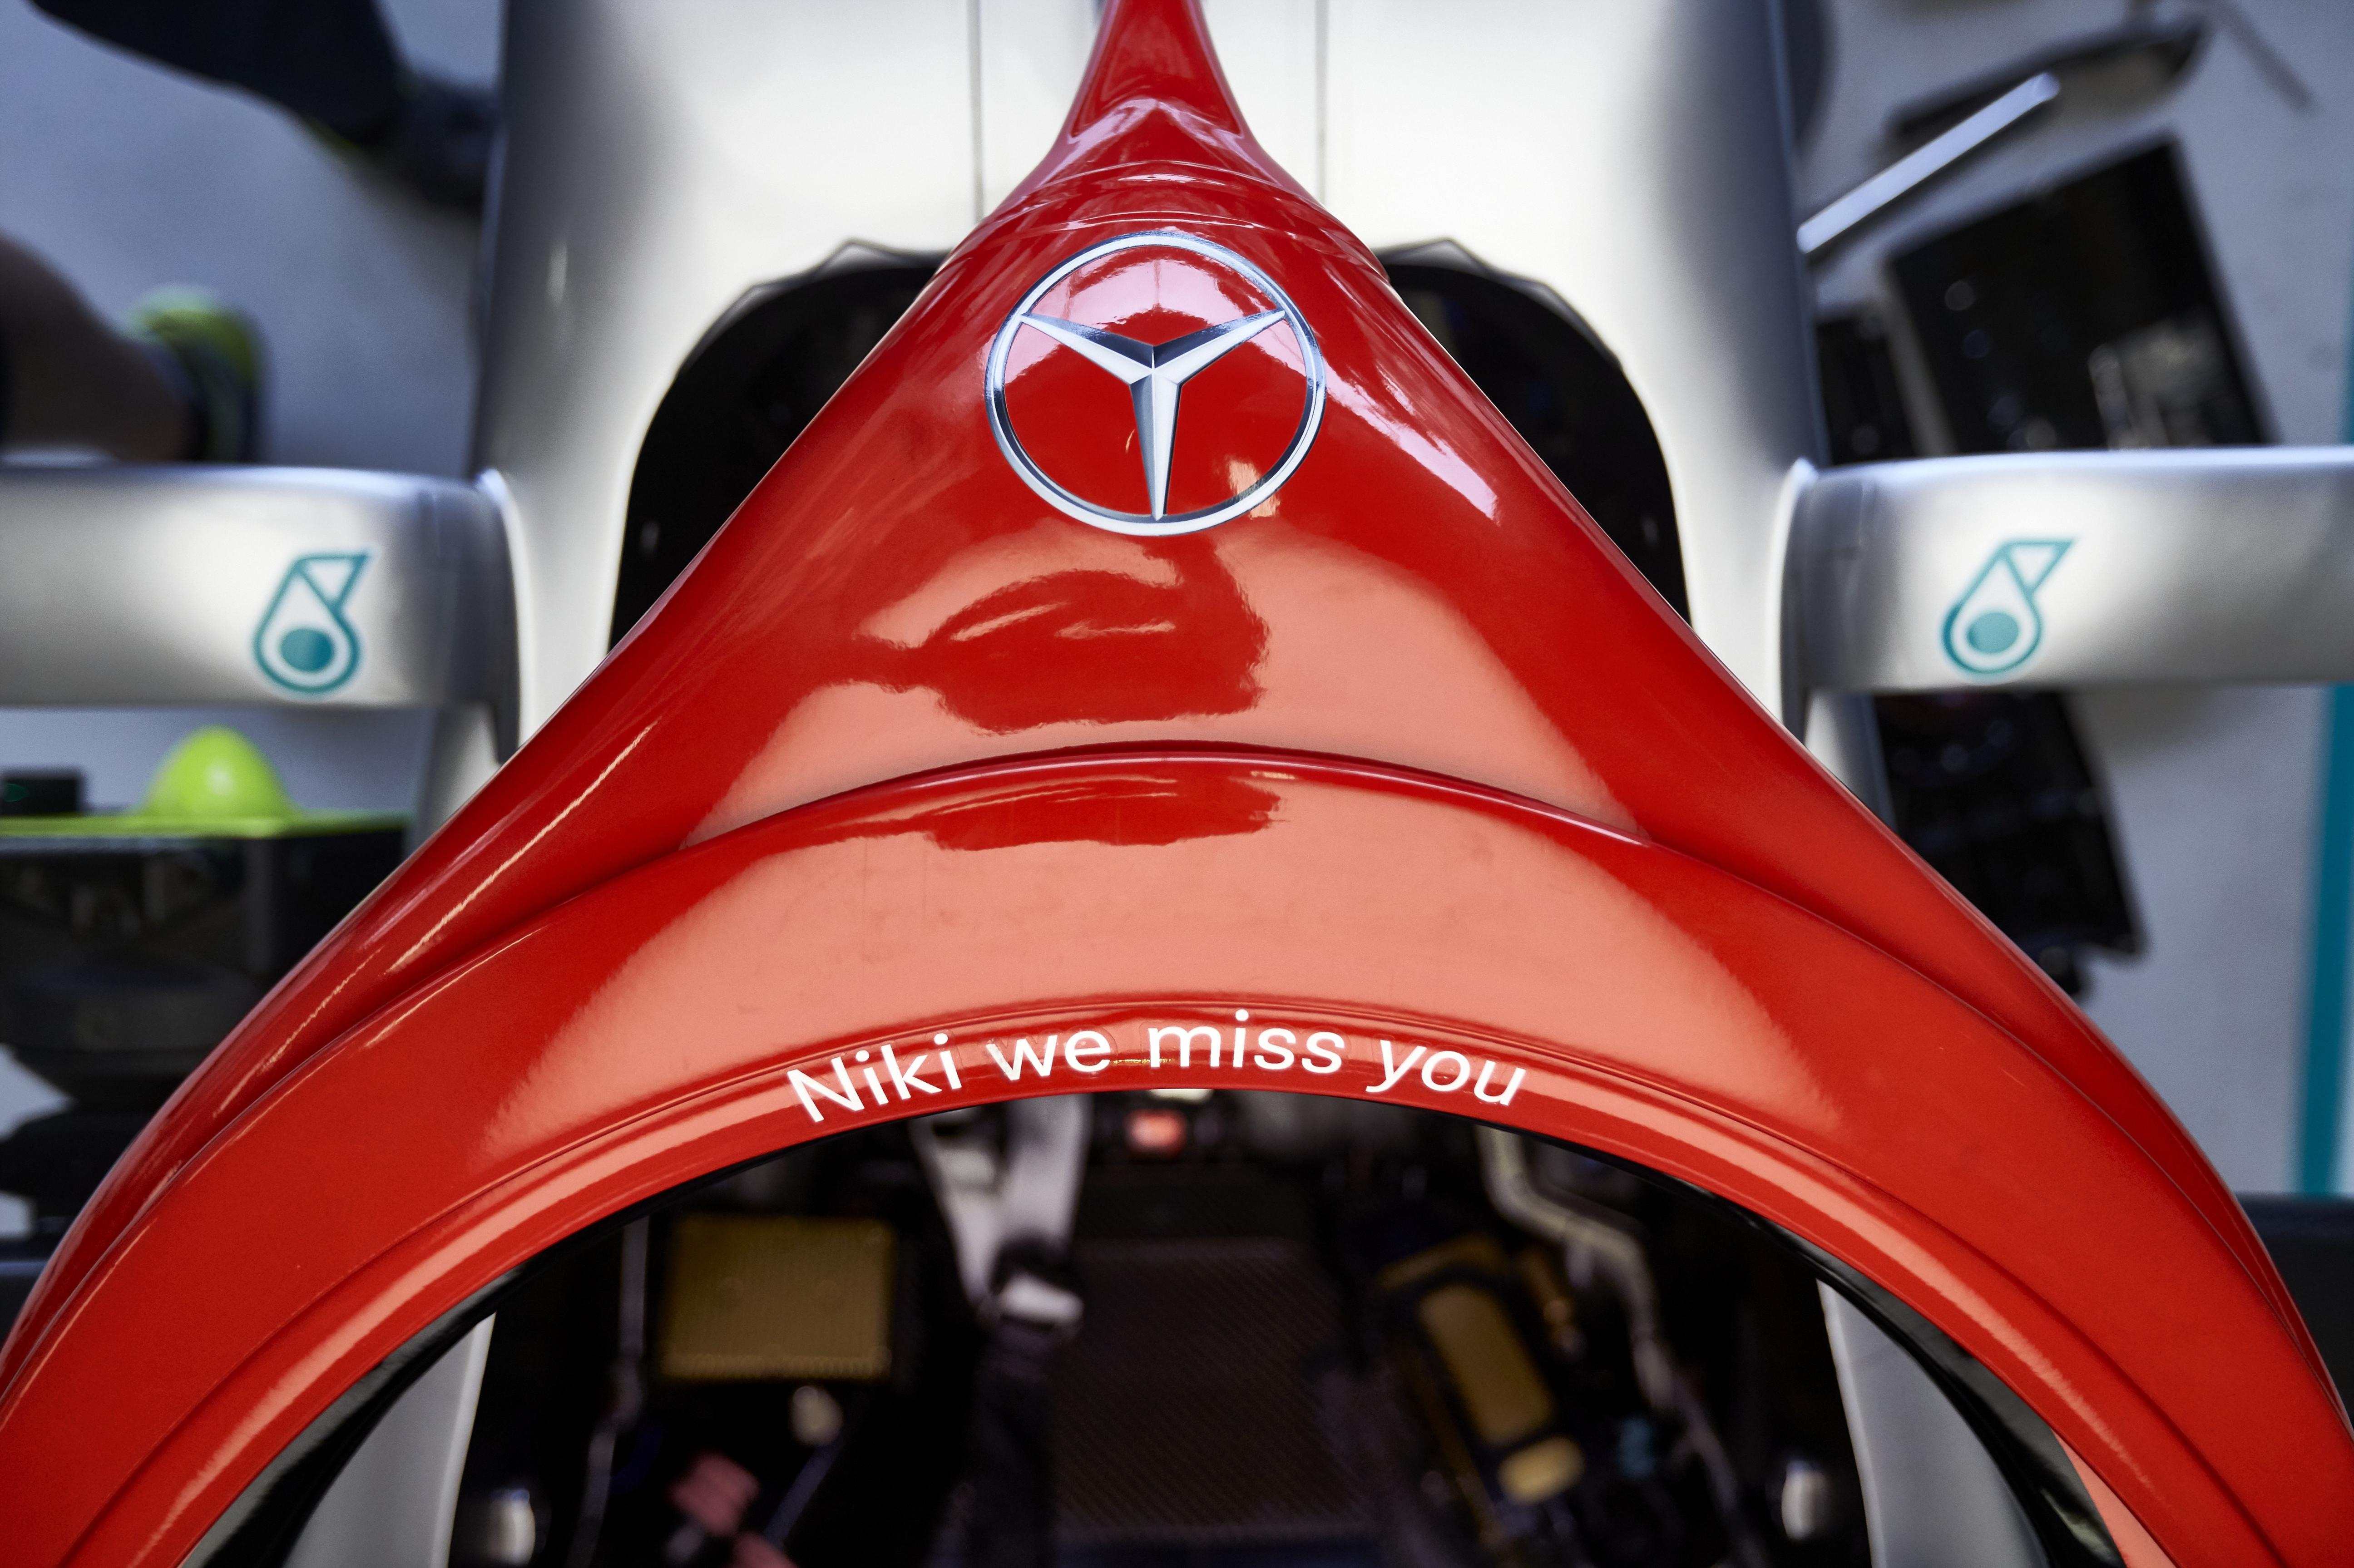 2019 Monaco Grand Prix, Friday Steve Etherington